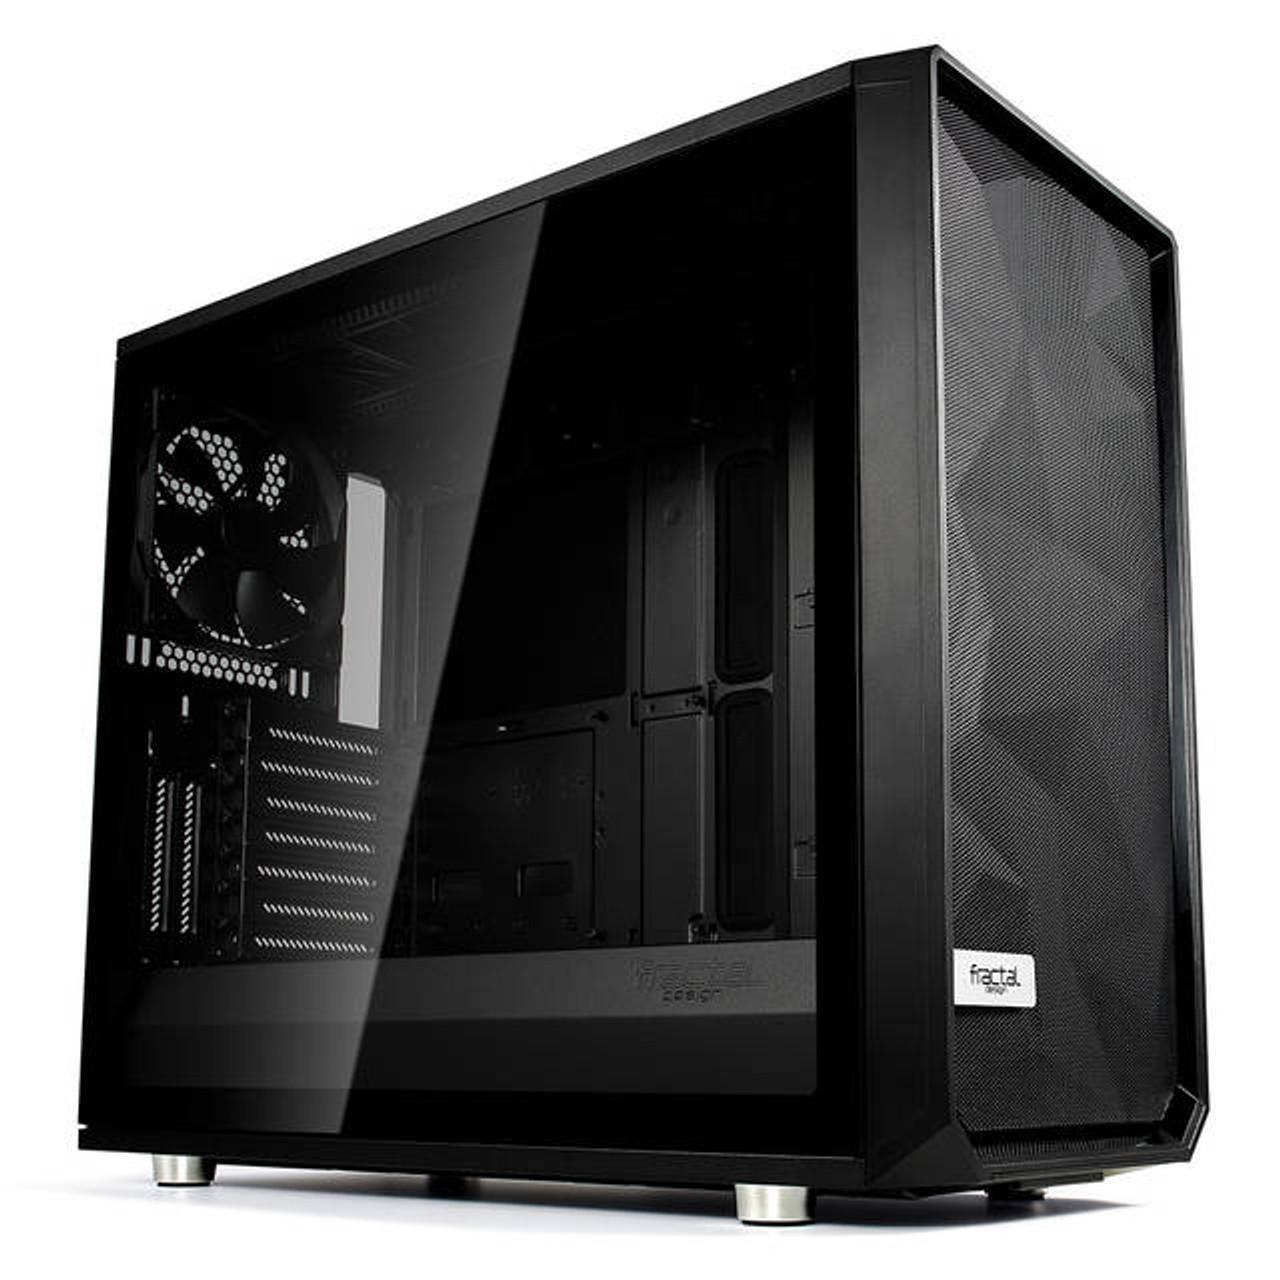 Dark TG FD-CA-MESH-C-BKO-TG Black ATX Mid Tower Compu Fractal Design Meshify C